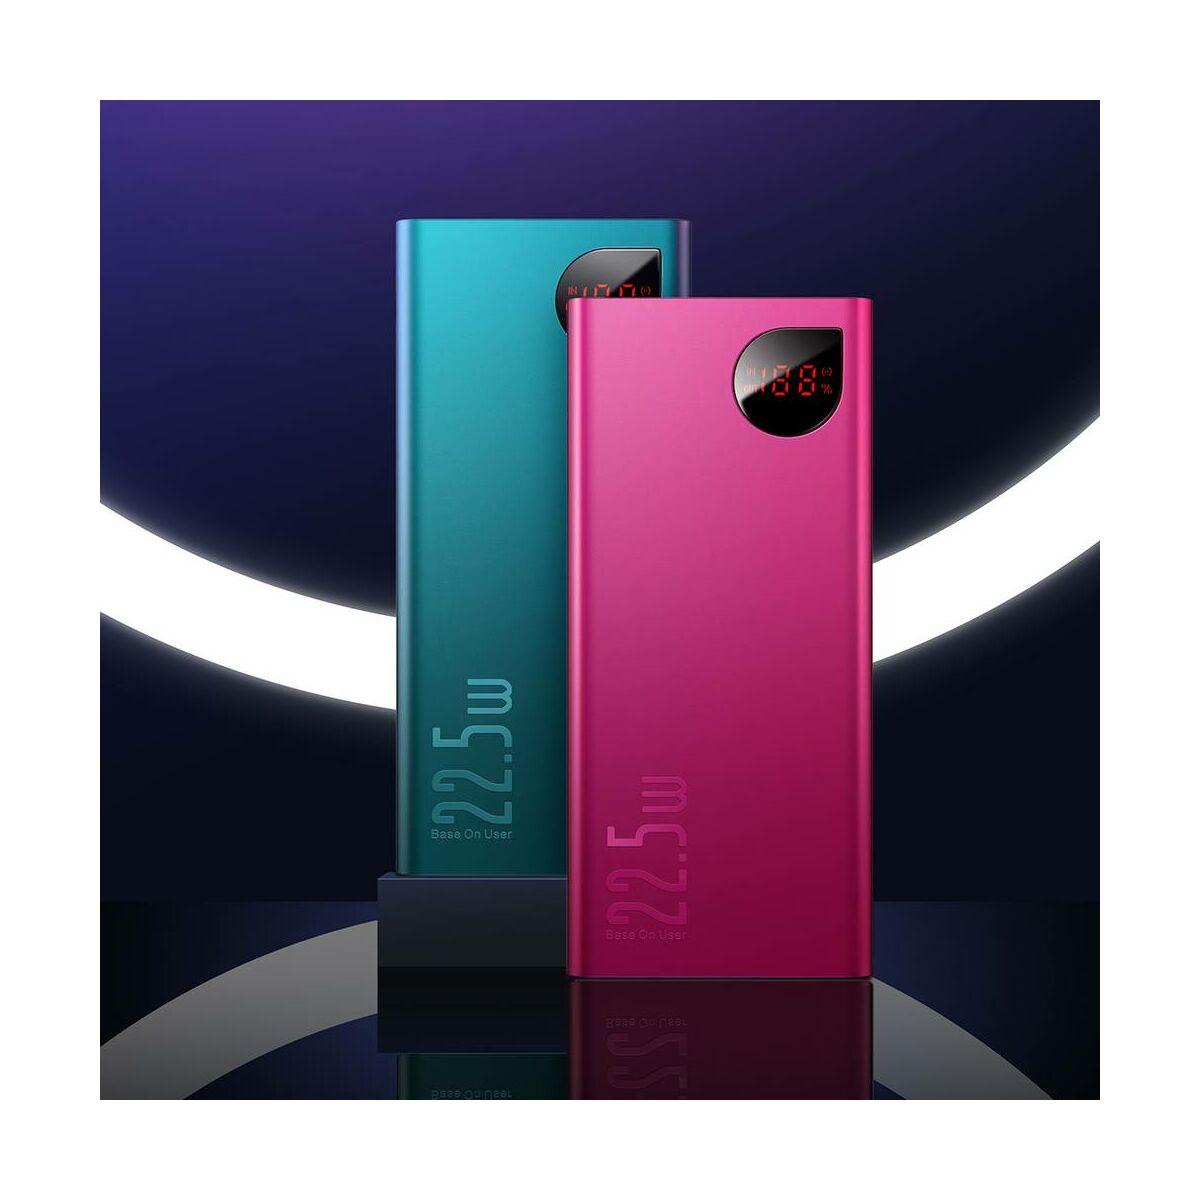 Baseus Power Bank Adaman PD3.0 18W, Quick Charge QC3.0 22.5W, 20000 mAh, piros (PPIMDA-A09)